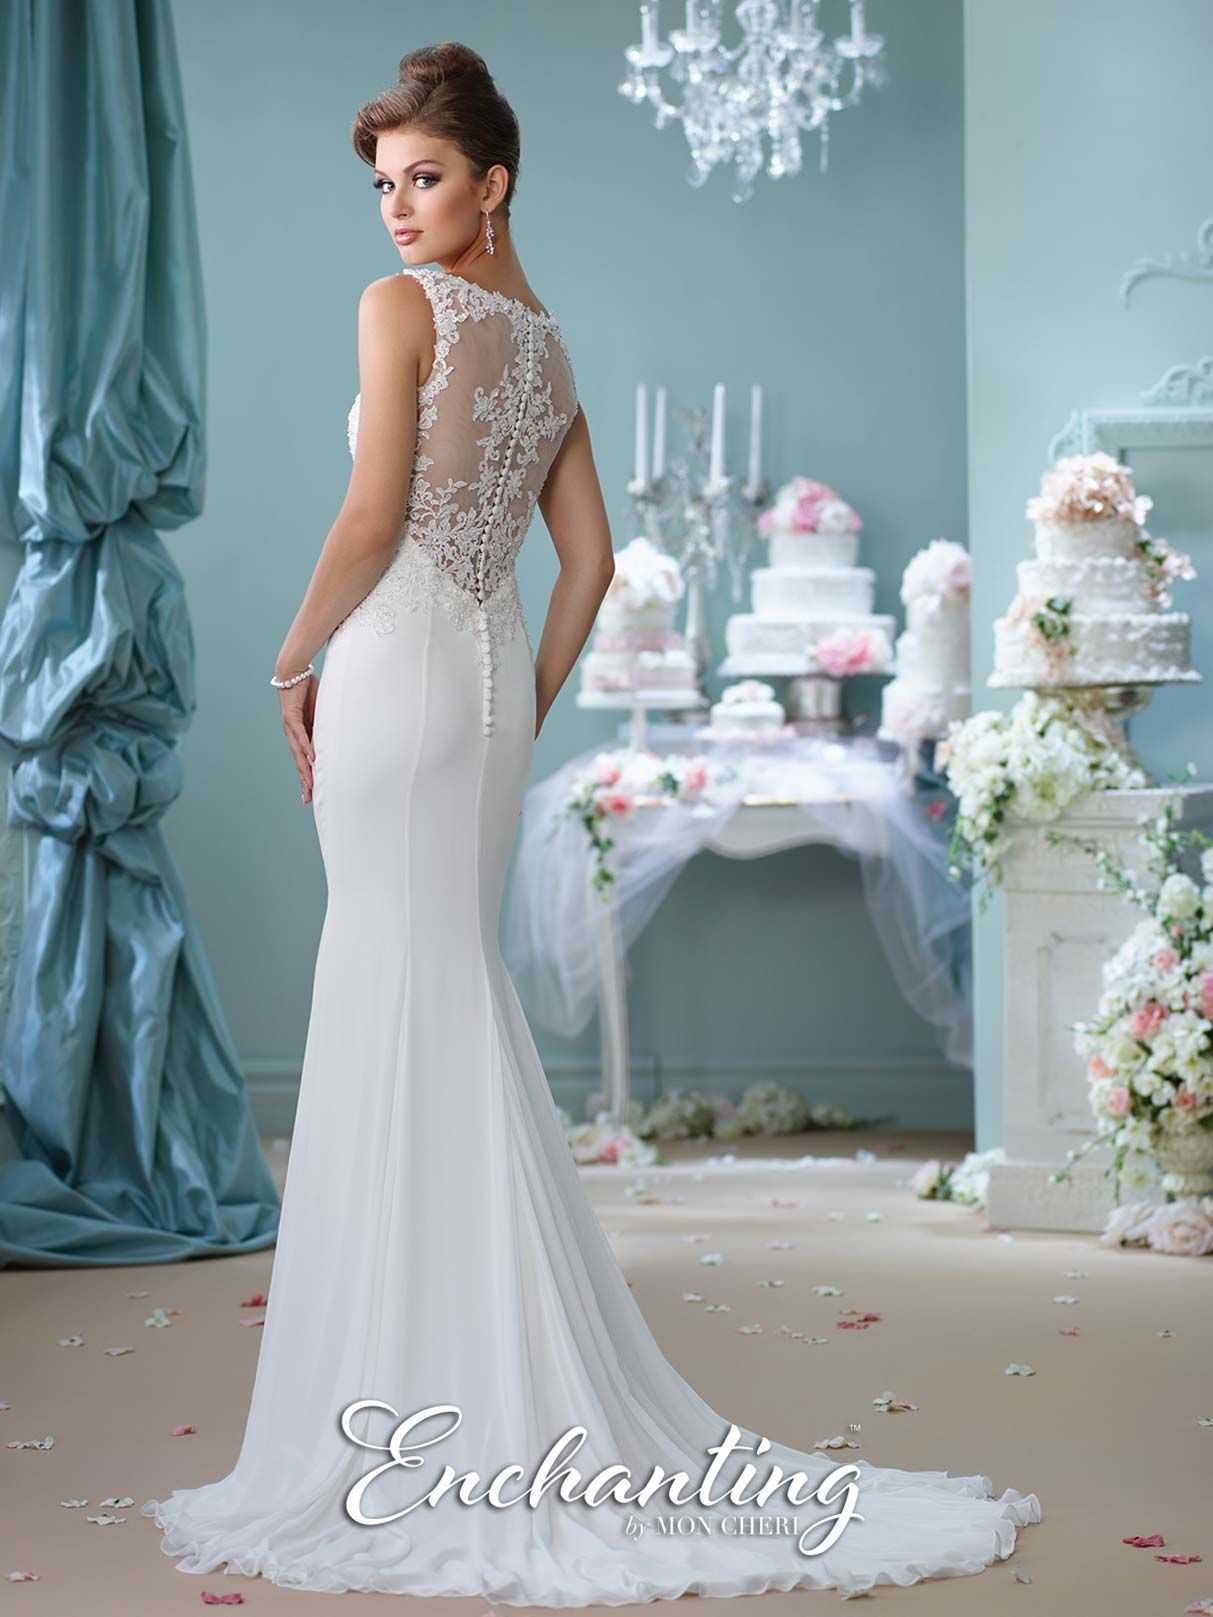 Beautiful Wedding Dress Hire Belfast Images - Wedding Plan Ideas ...